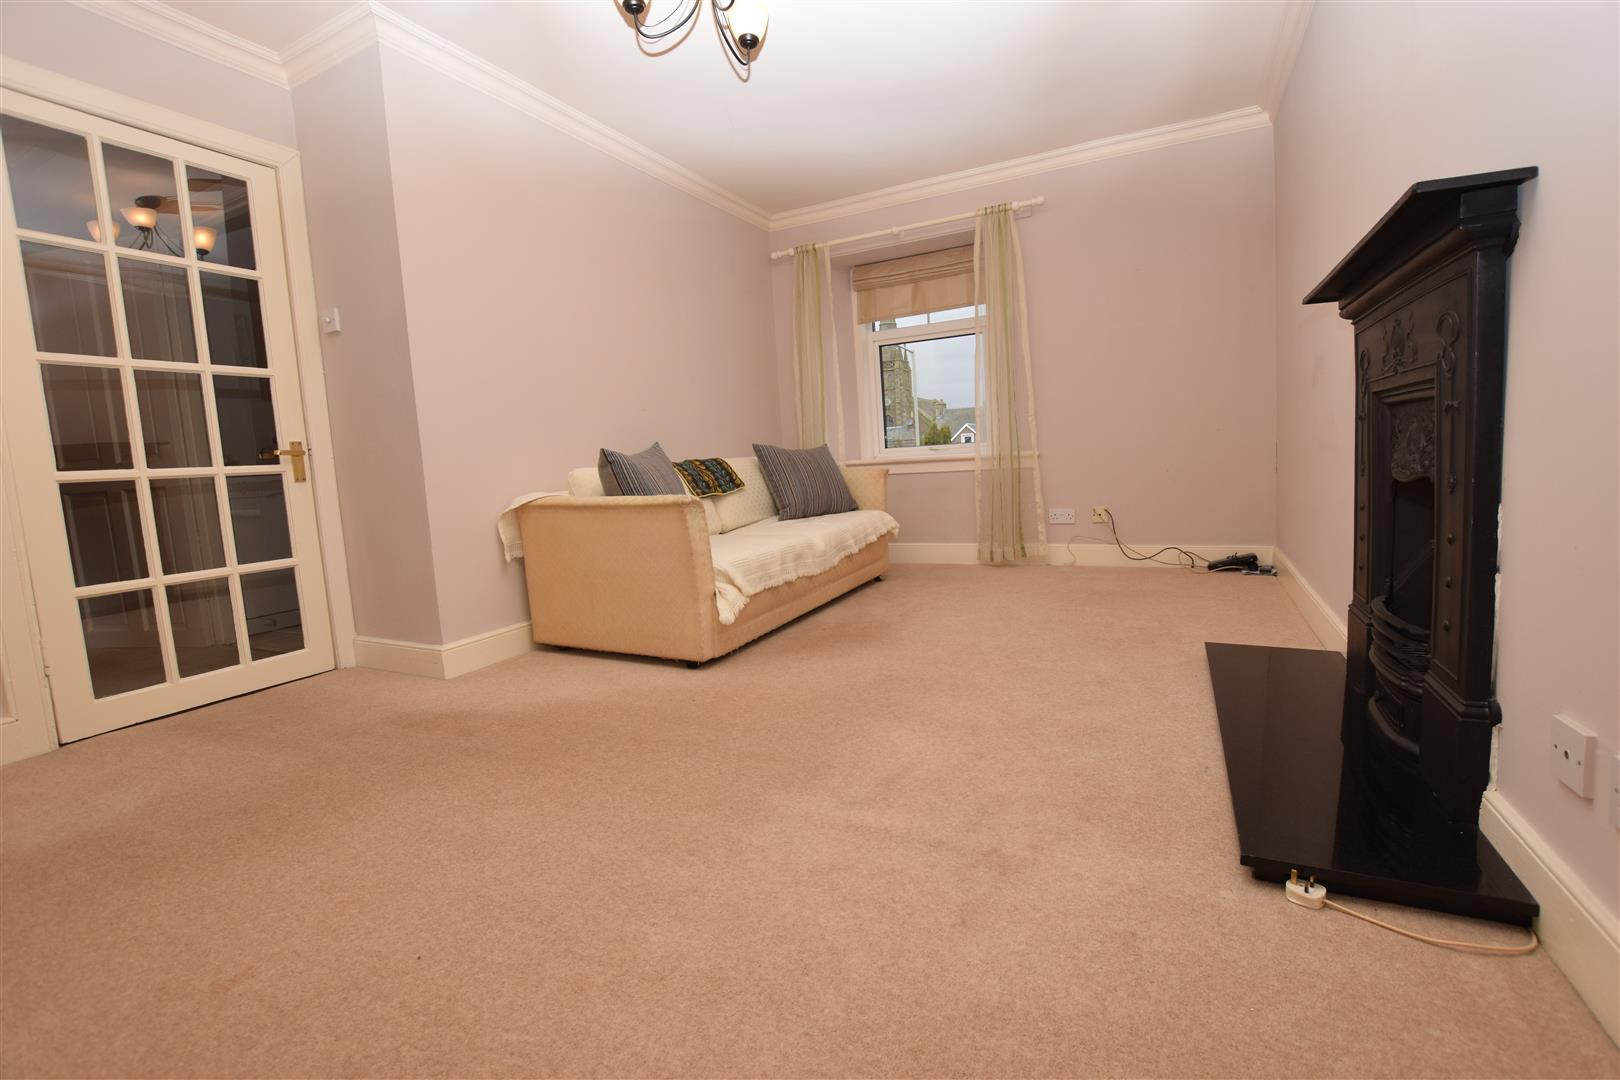 Upper Flat, Rattray House, Stirling Street, Blackford, Auchterarder, Perthshire, PH4 1QA, UK